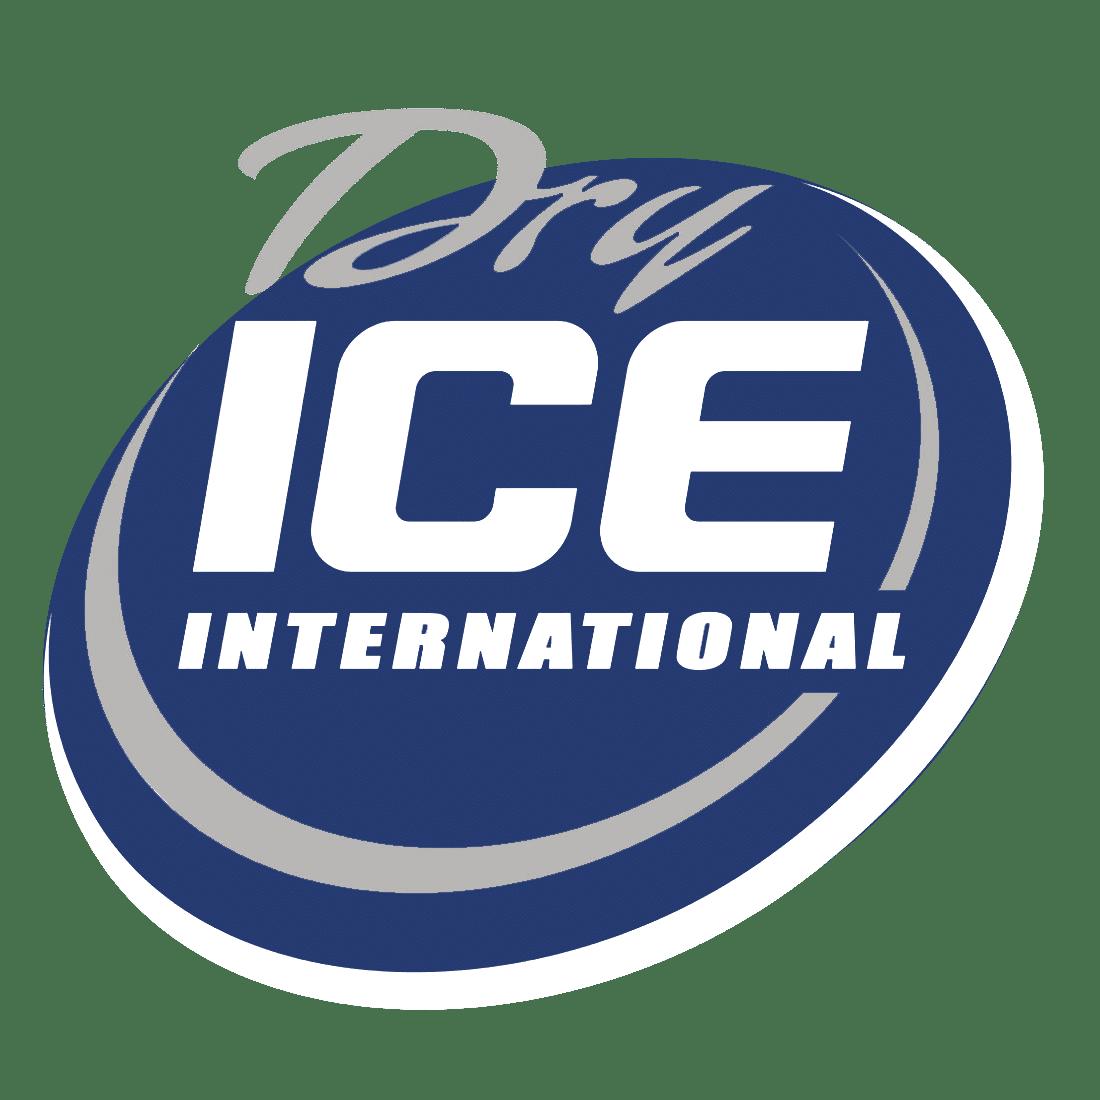 web-logo-int